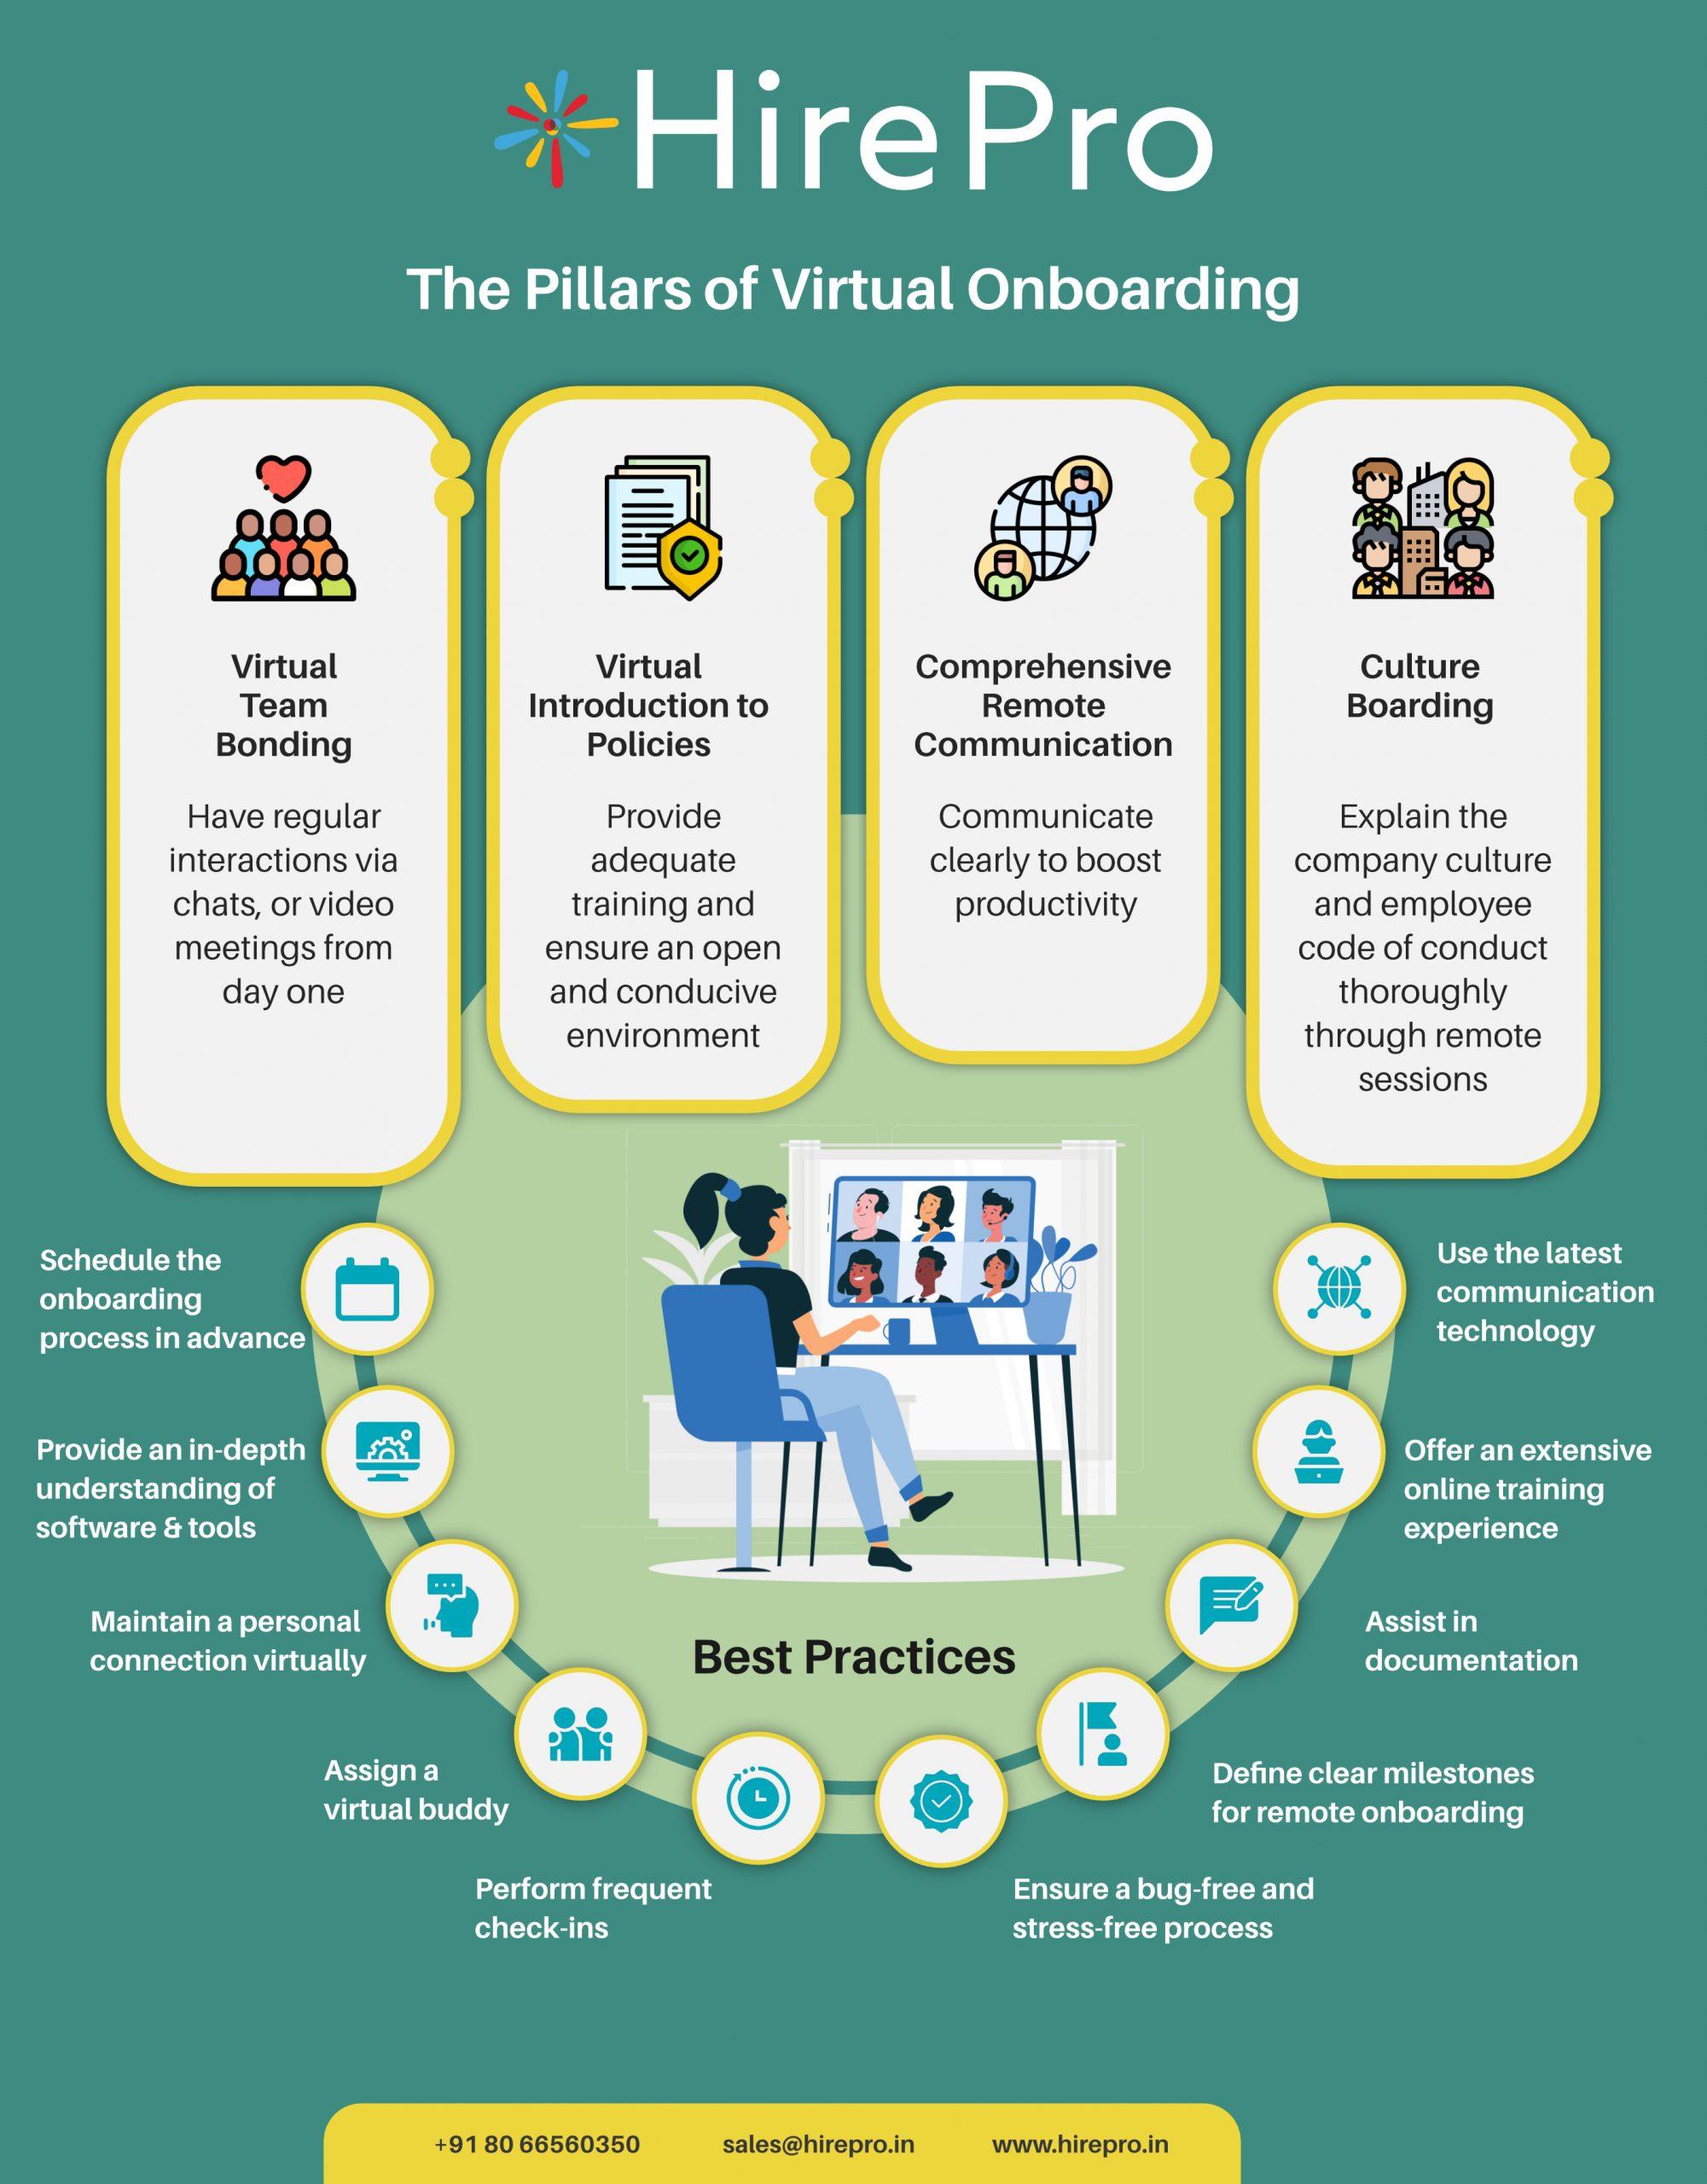 The Pillars of Virtual Onboarding